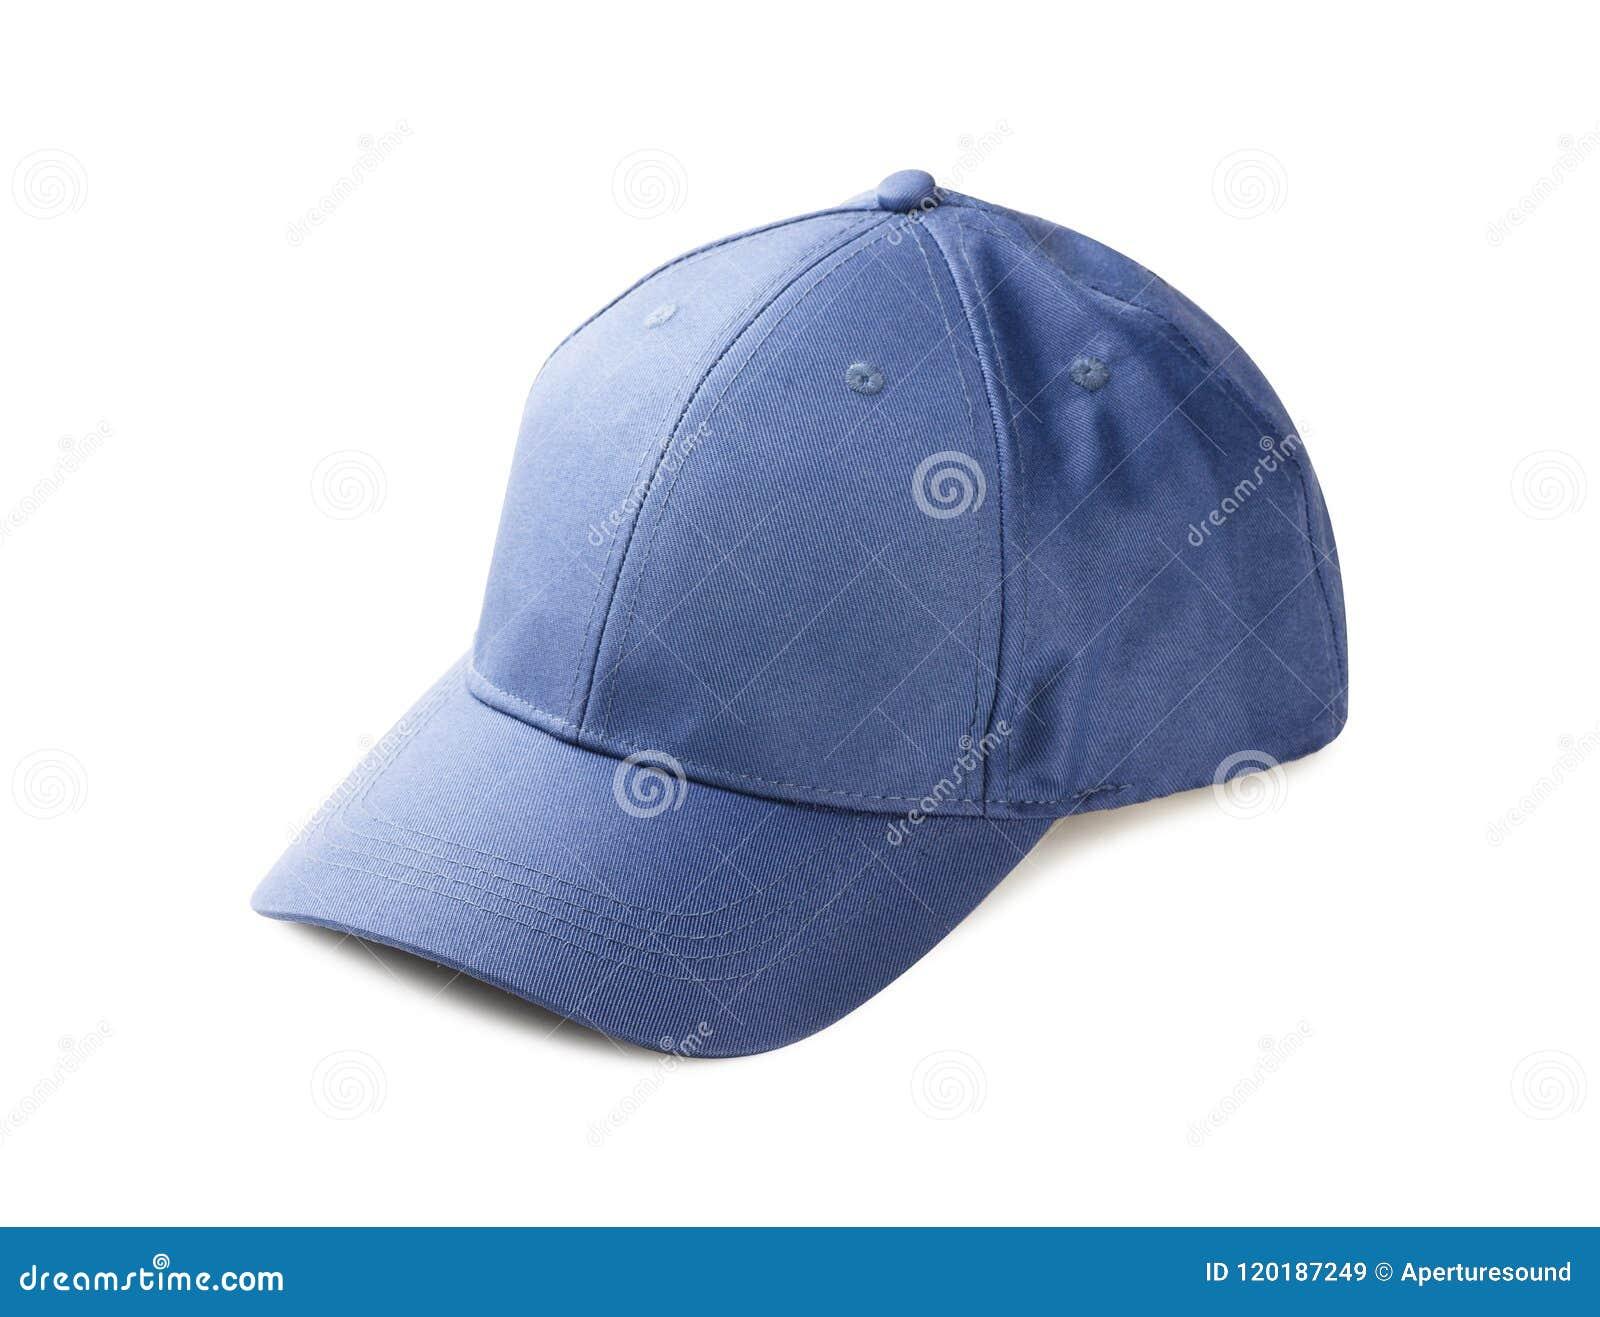 Gorra de béisbol azul imagen de archivo. Imagen de accesorio - 120187249 729f0dbc07d